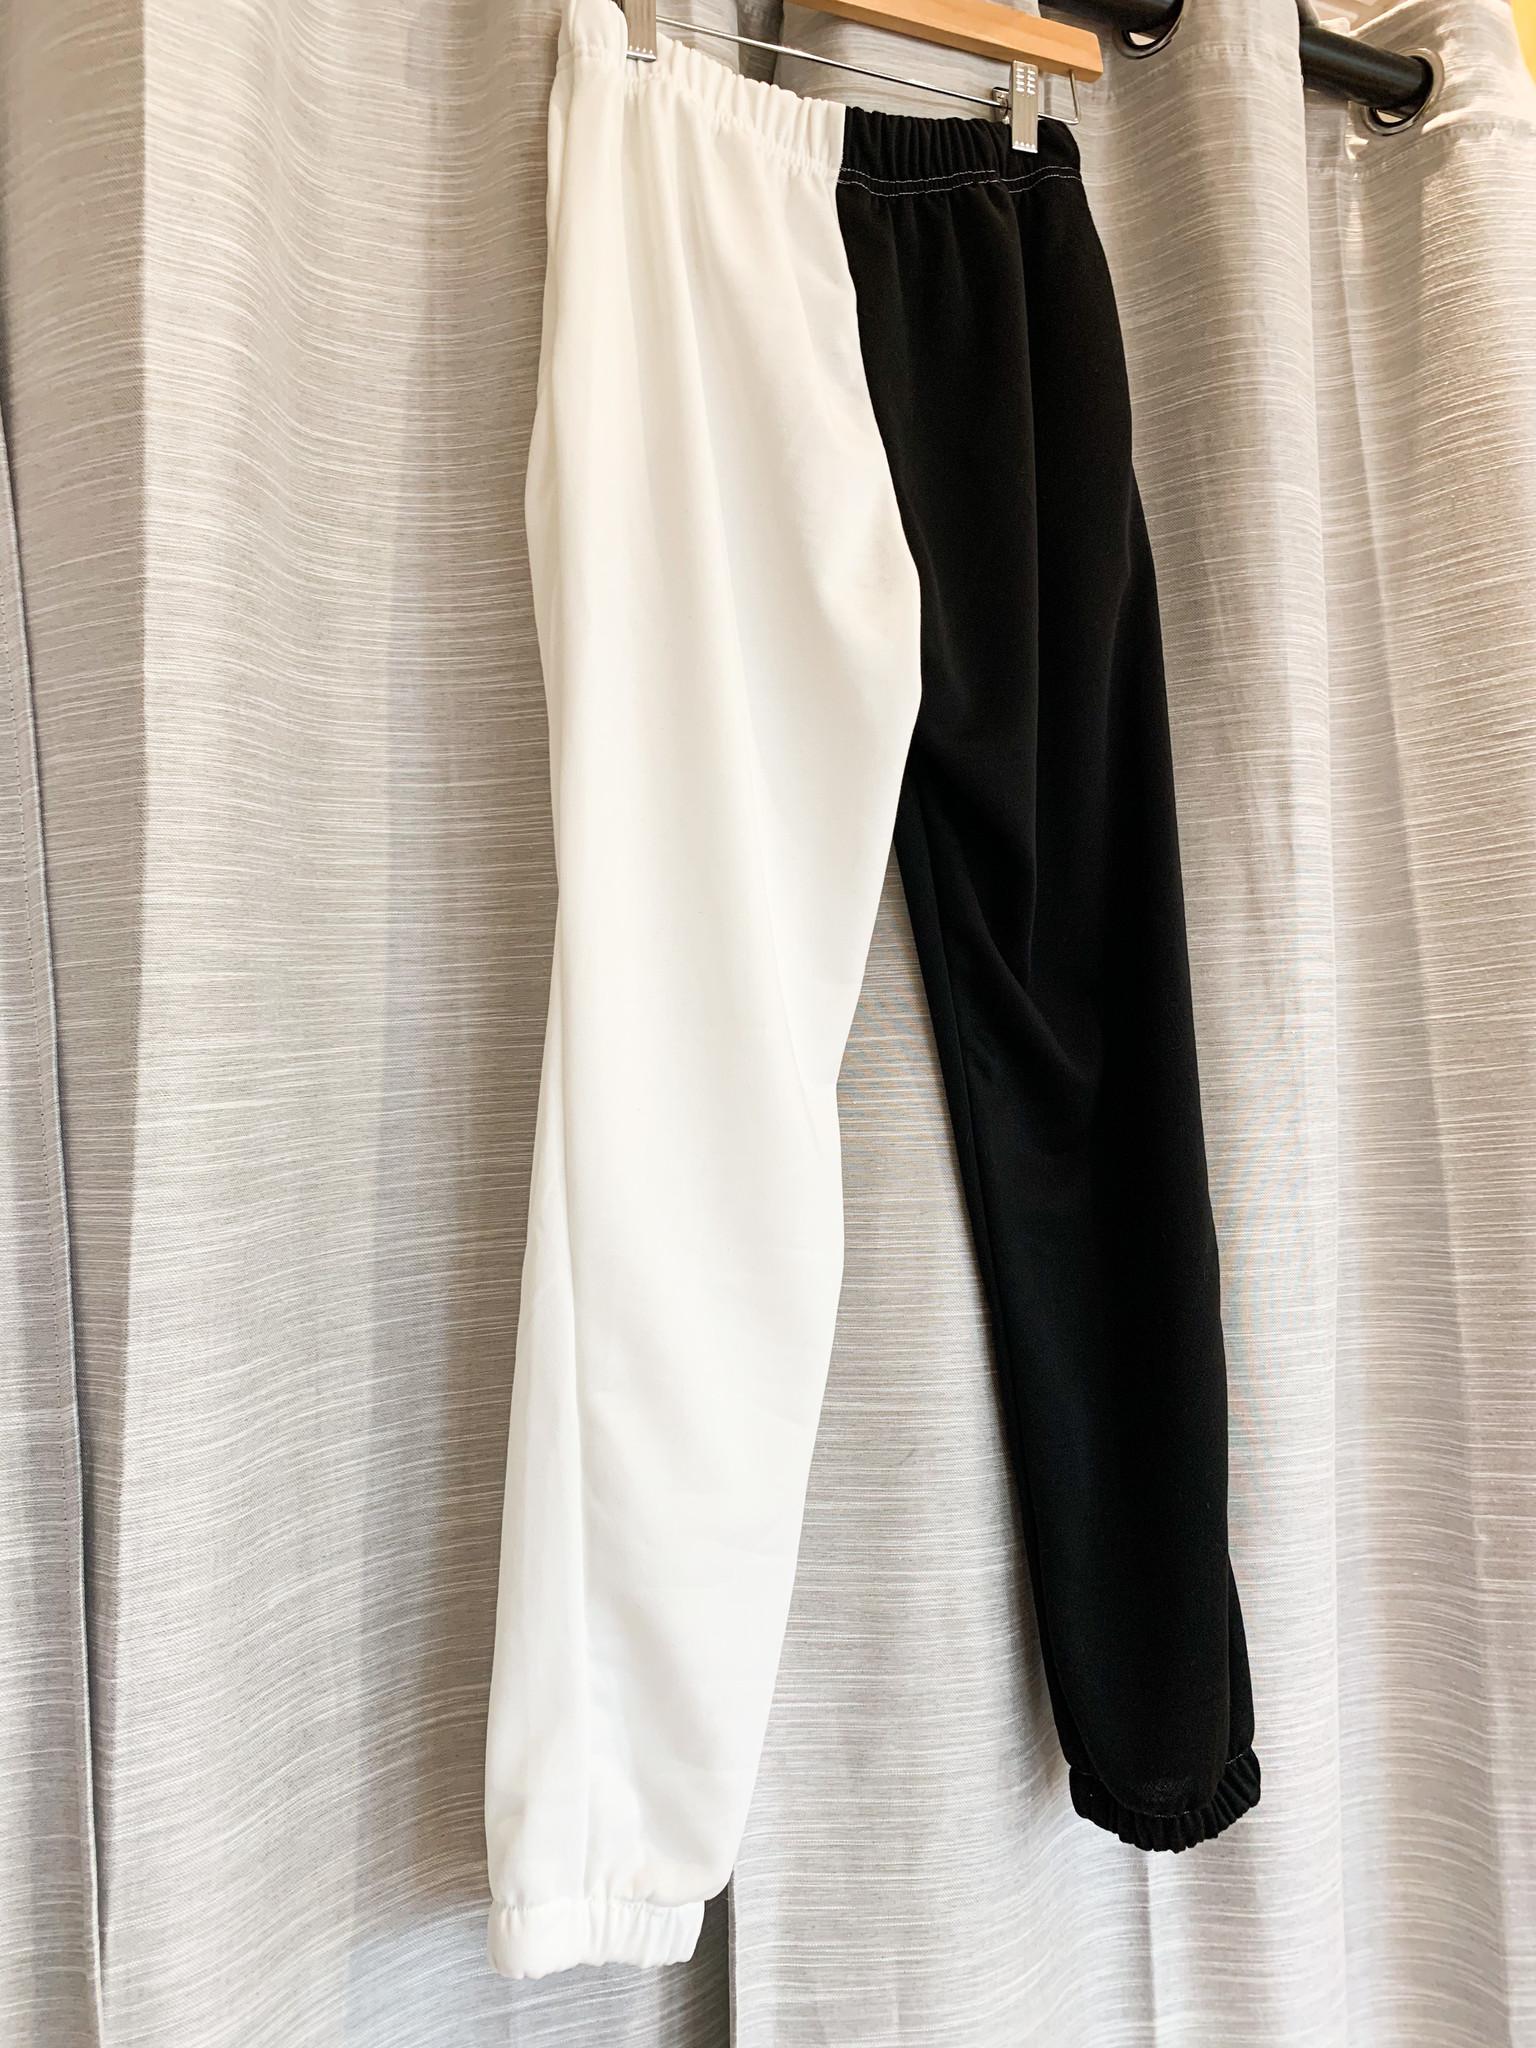 White/Black Color Block Joggers